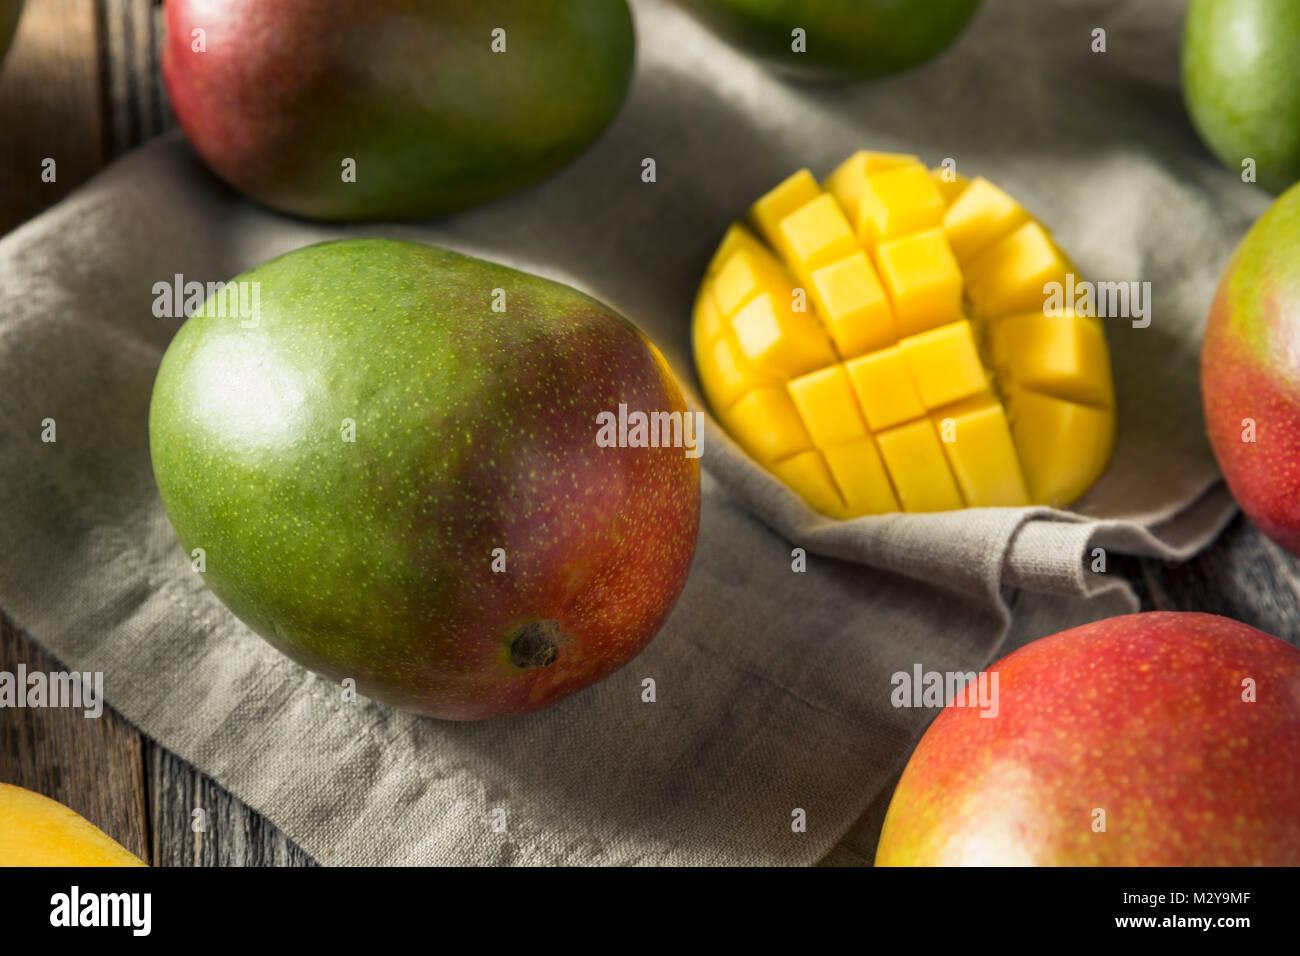 Raw Red Green Organic Mango Fruit Ready to Eat - Stock Image